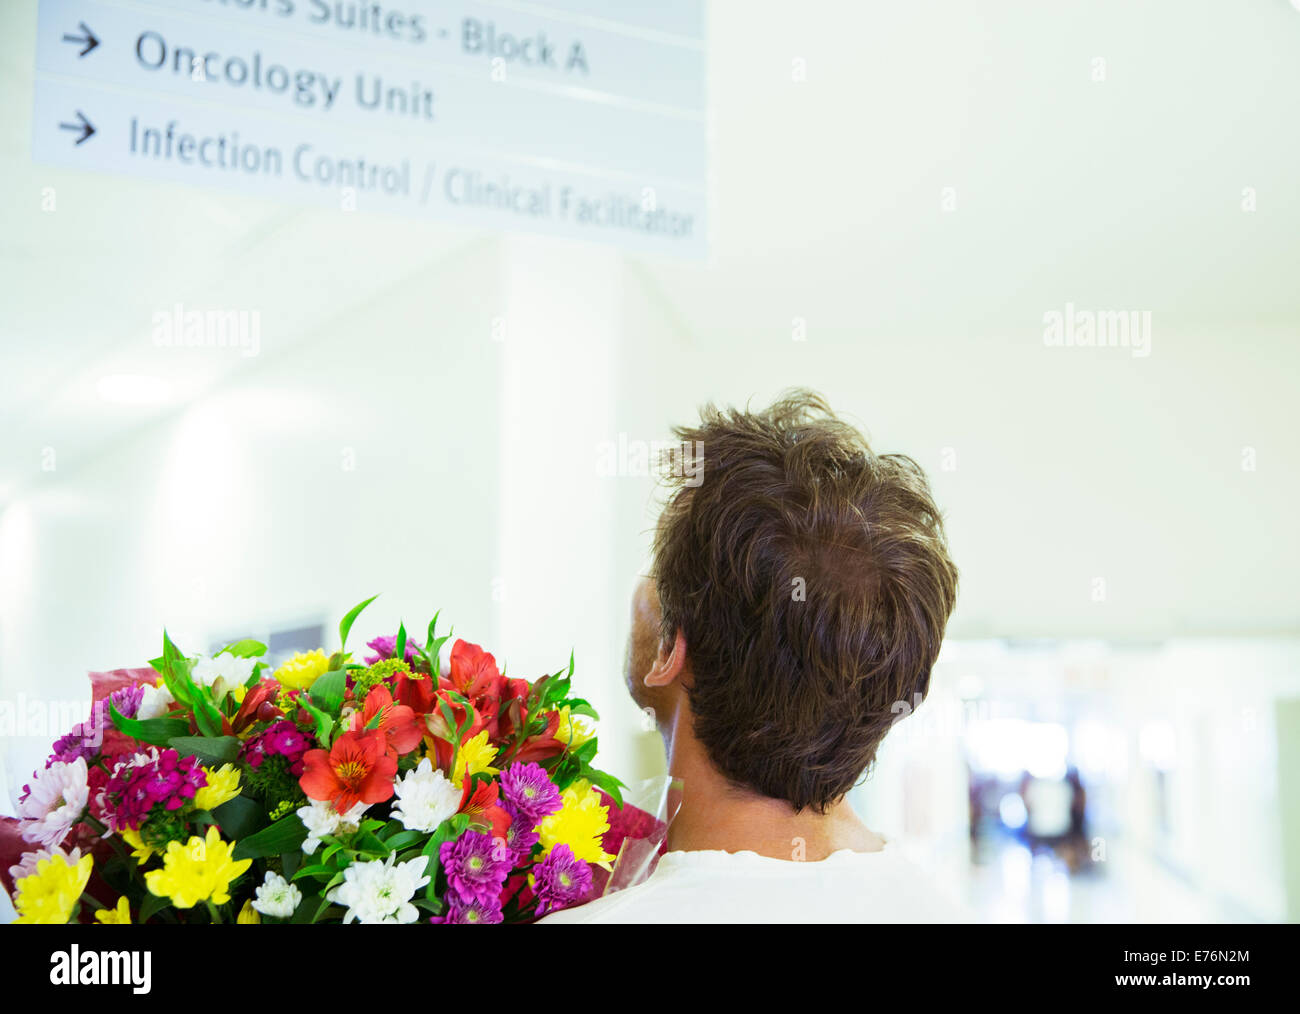 El hombre lleva el ramo de flores en el hospital Foto de stock